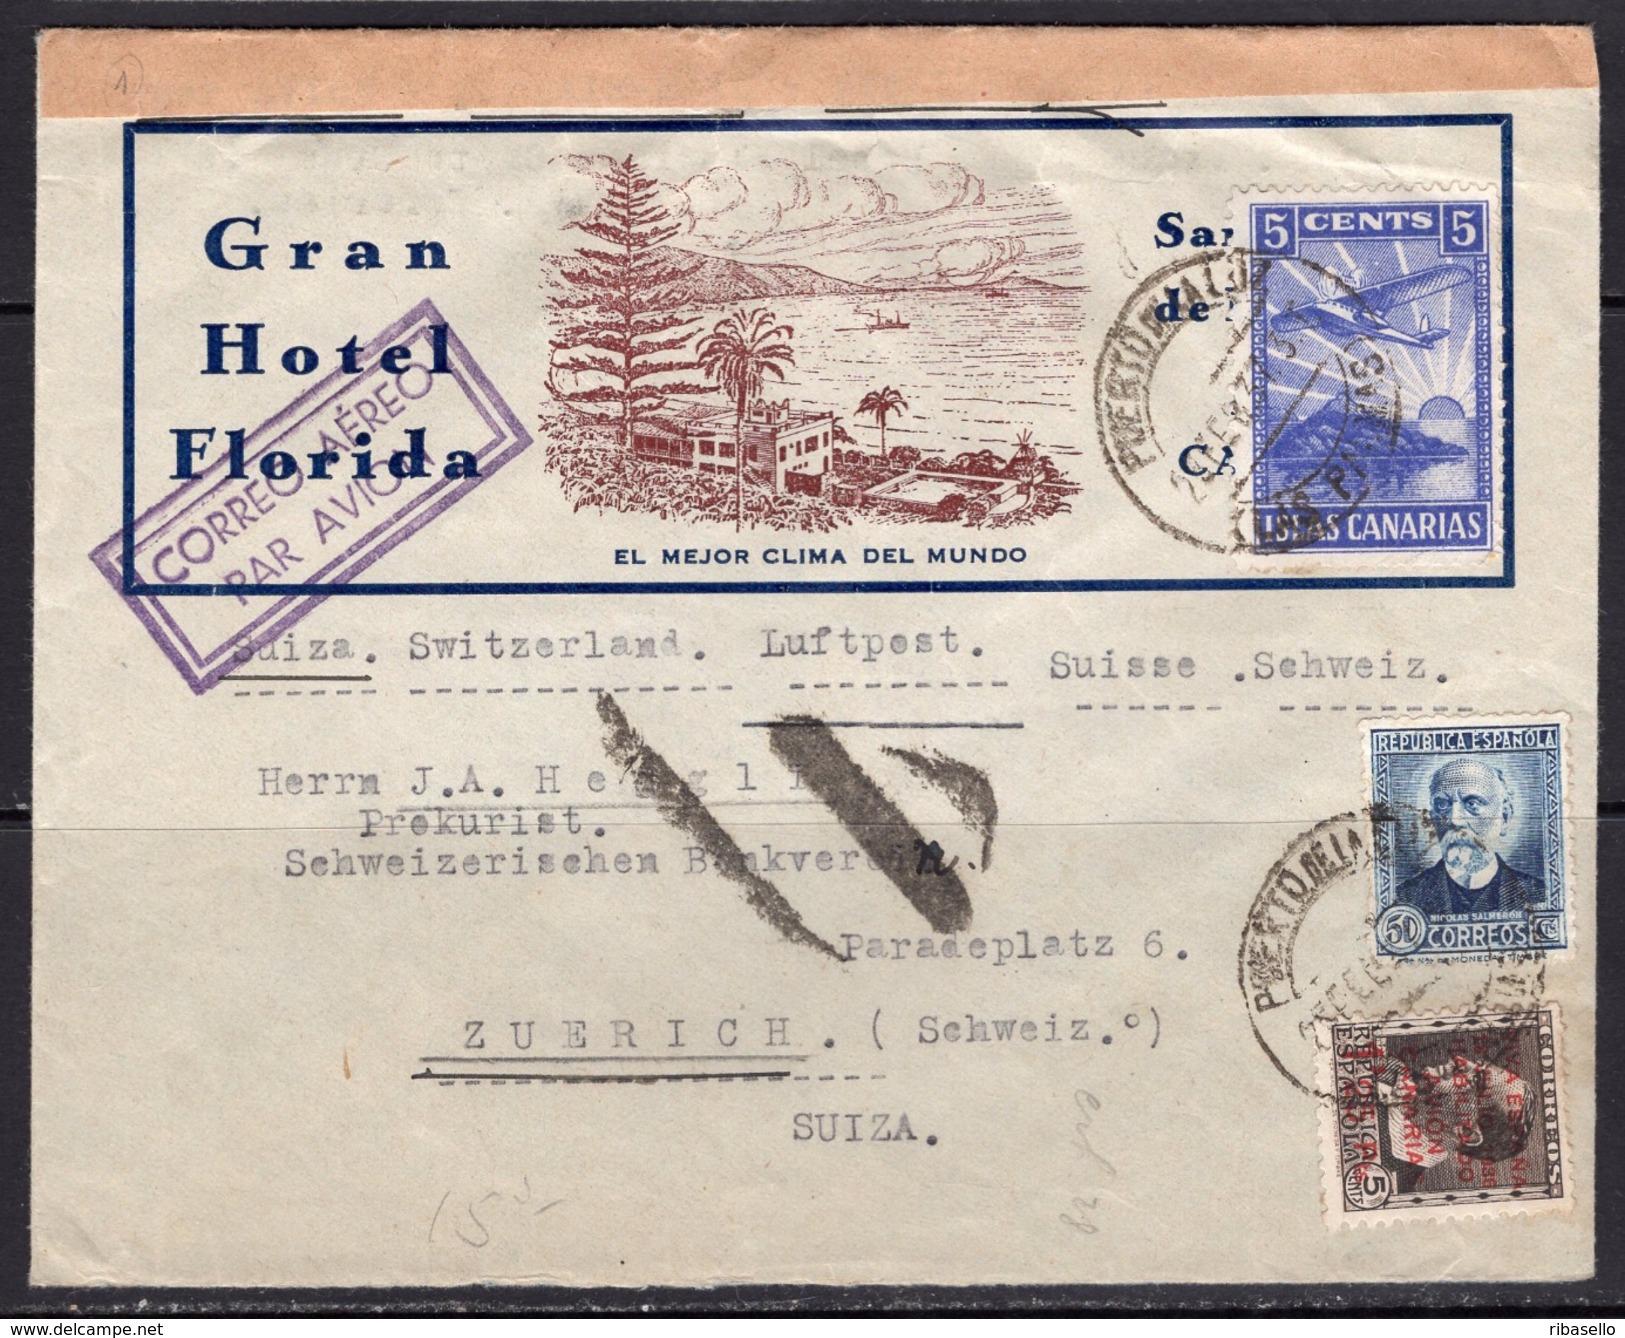 España 1937. Canarias. Carta De Las Palmas A Zurich. Censura. - Marcas De Censura Nacional